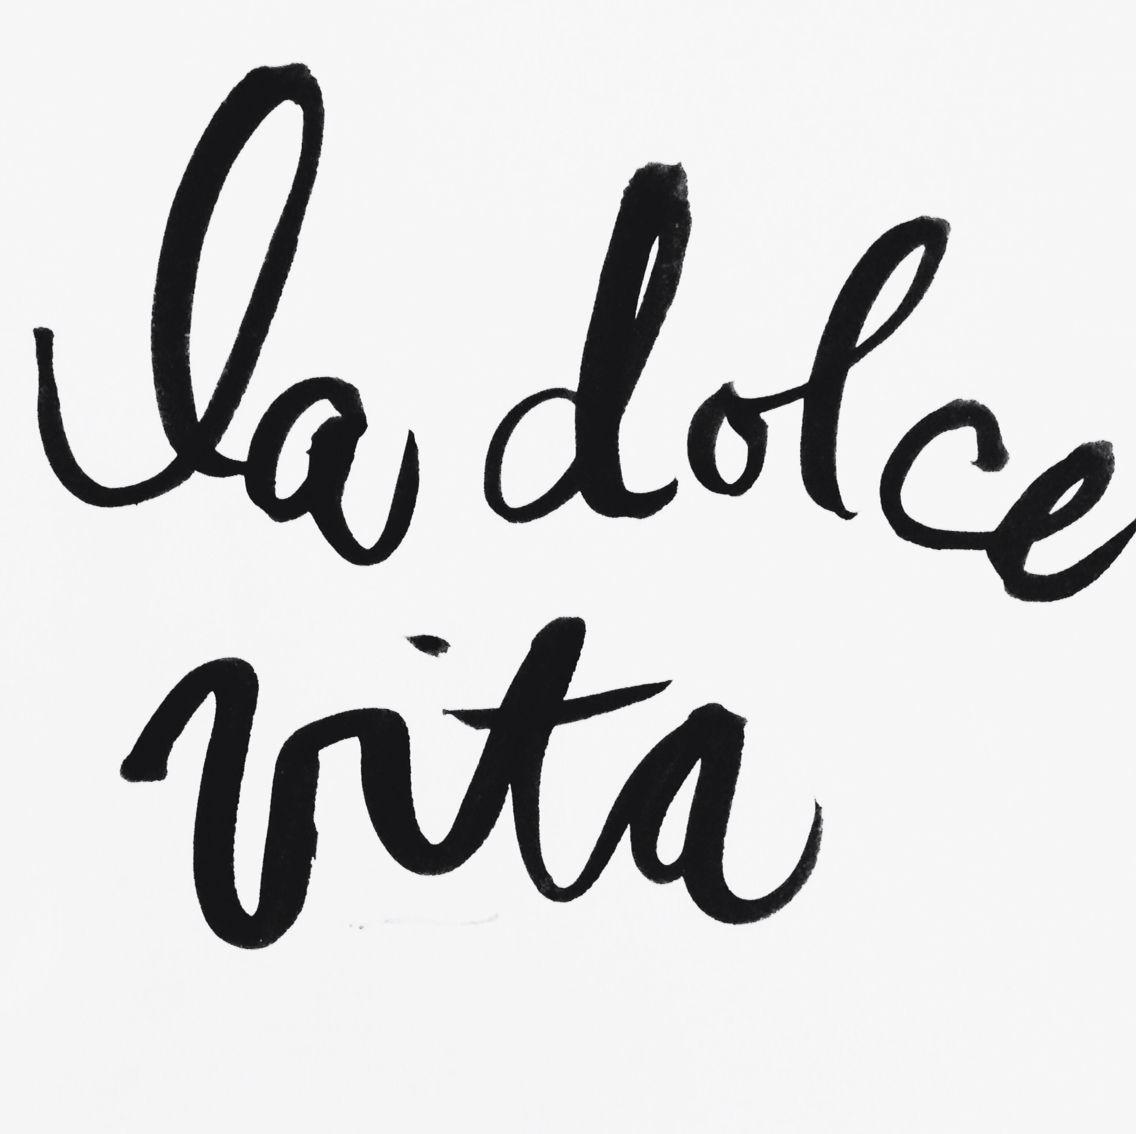 épinglé Par Lili Araujo Sur Para Inspirar Citations Italiennes Citation La Dolce Vita